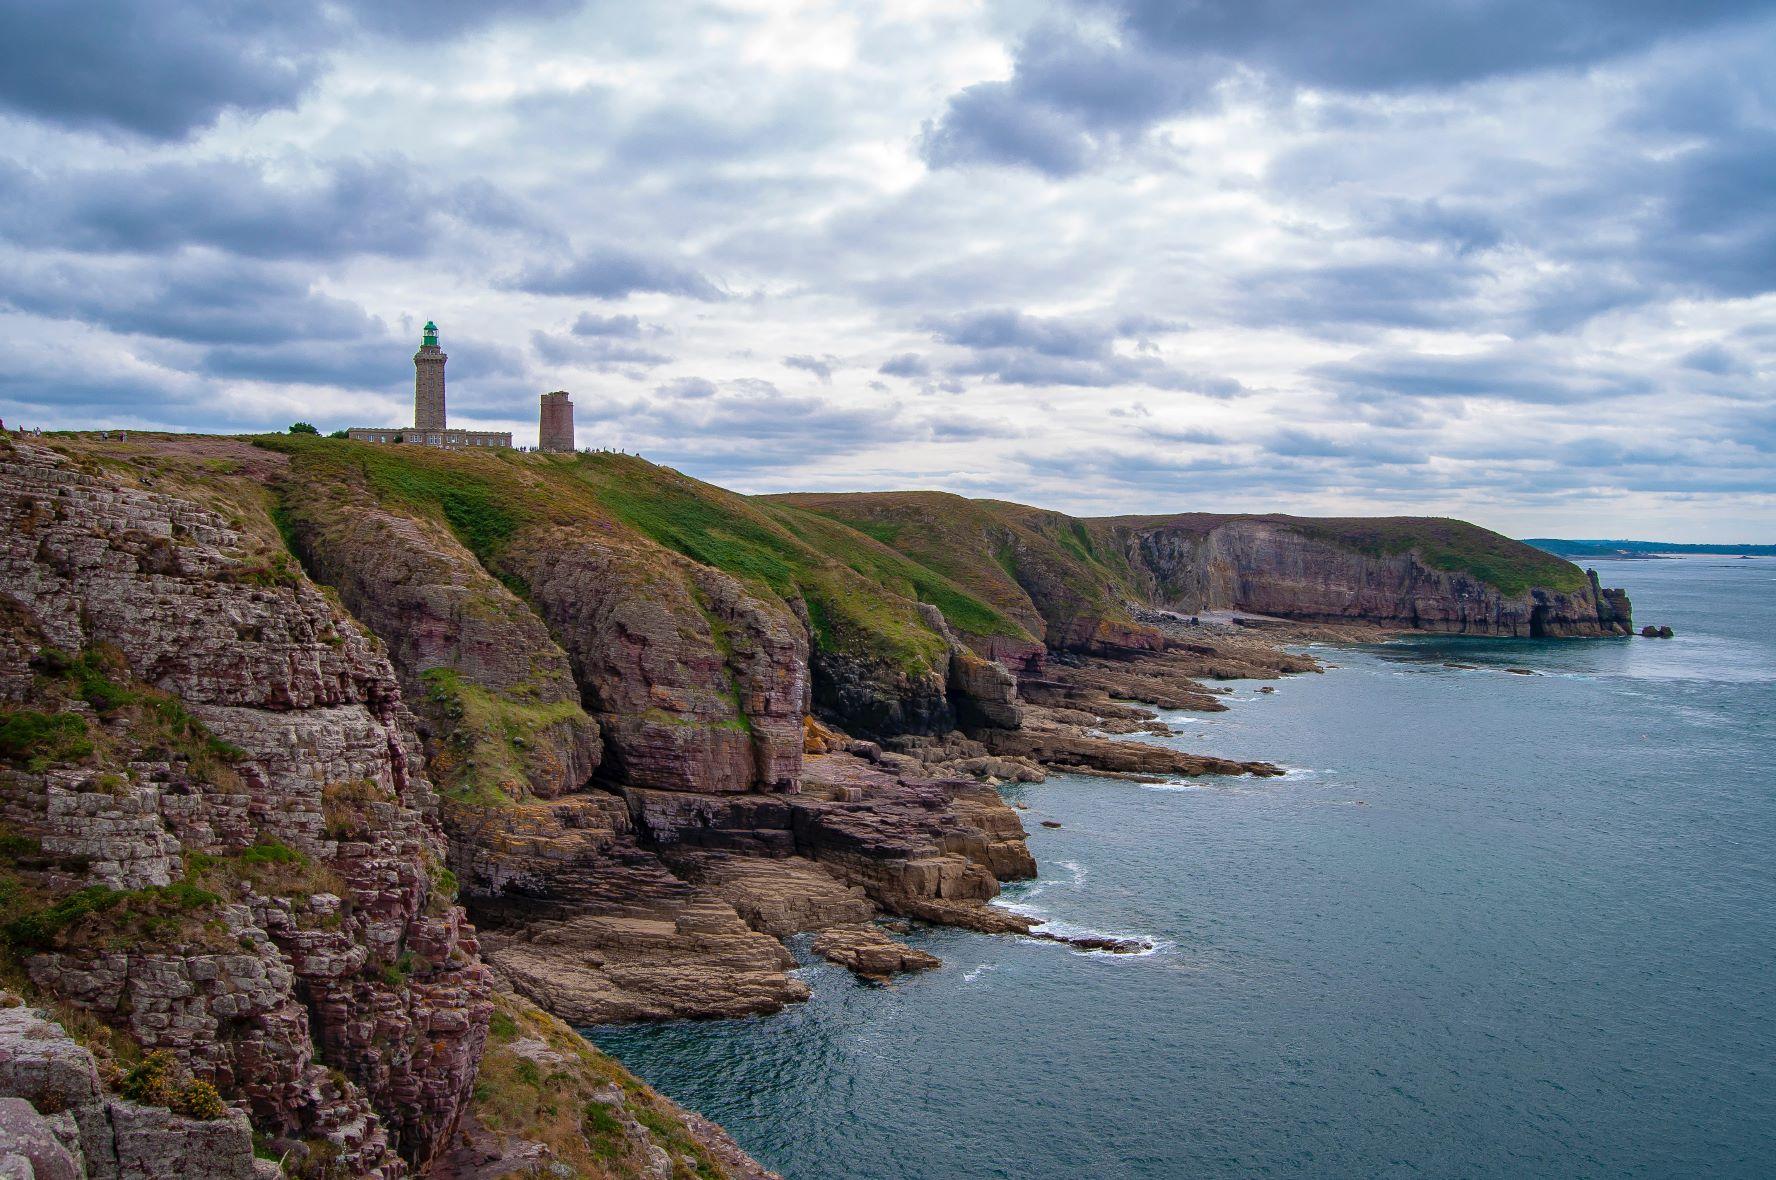 Vacances en Bretagne - Pays Bigouden - Welogin